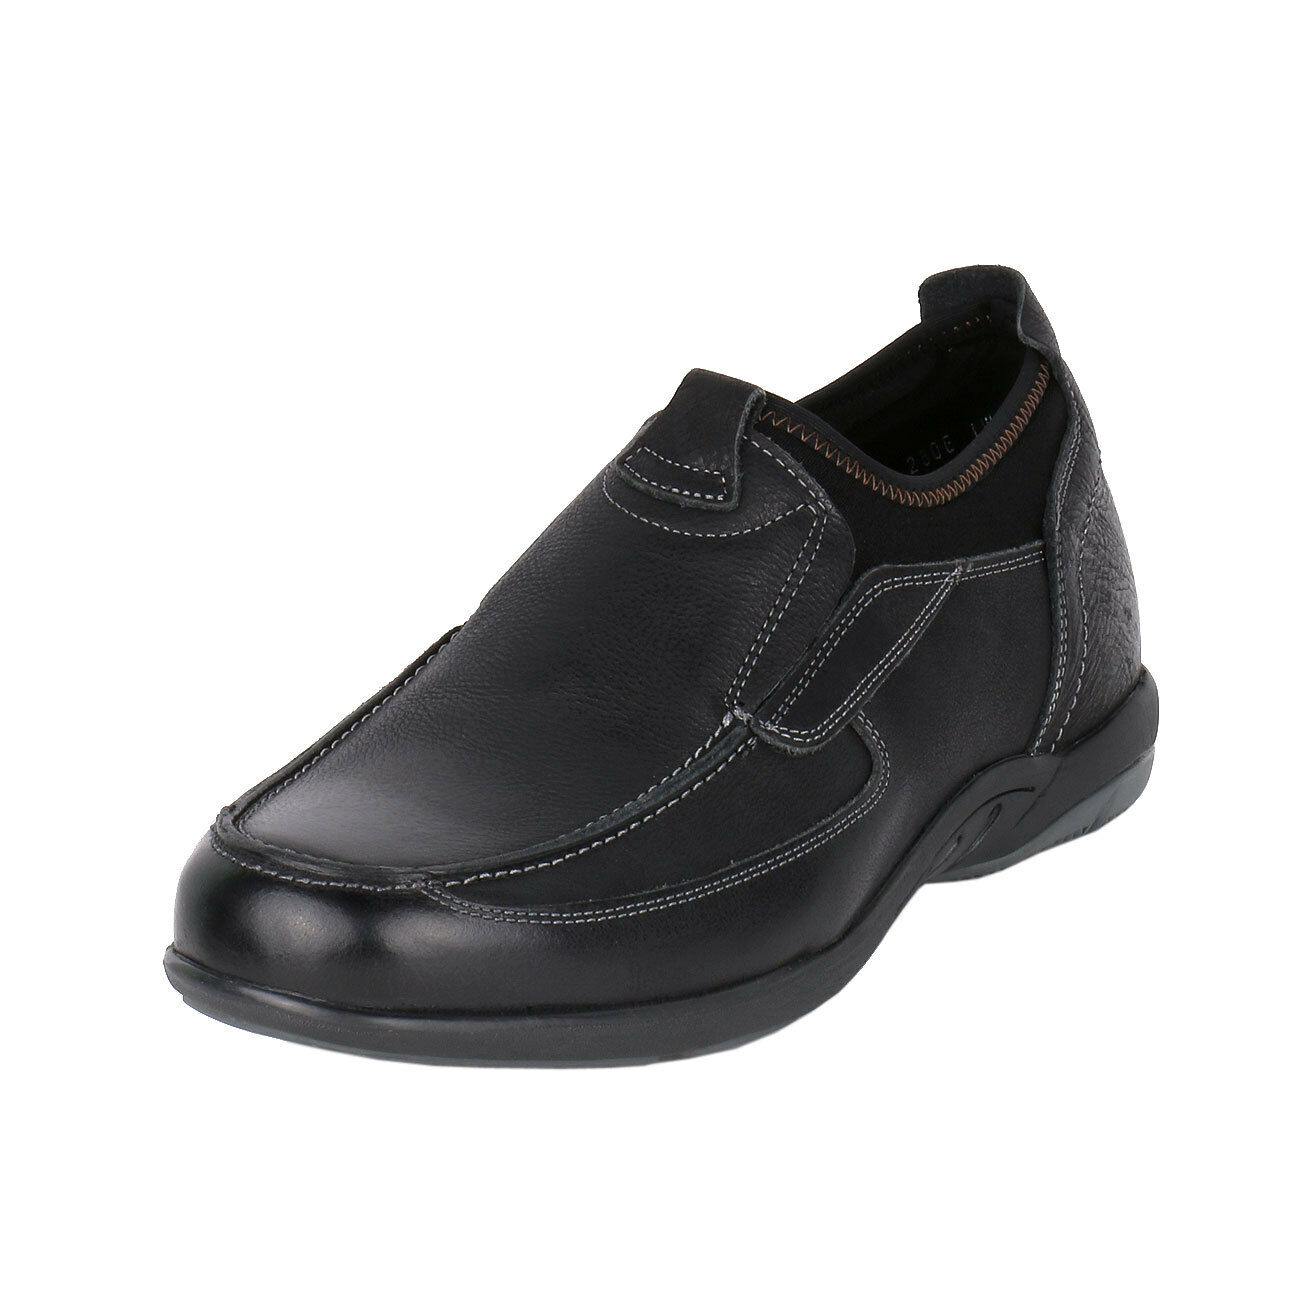 Fashion Slip-on Shoe Comfort & Versatility Height Elevation 2